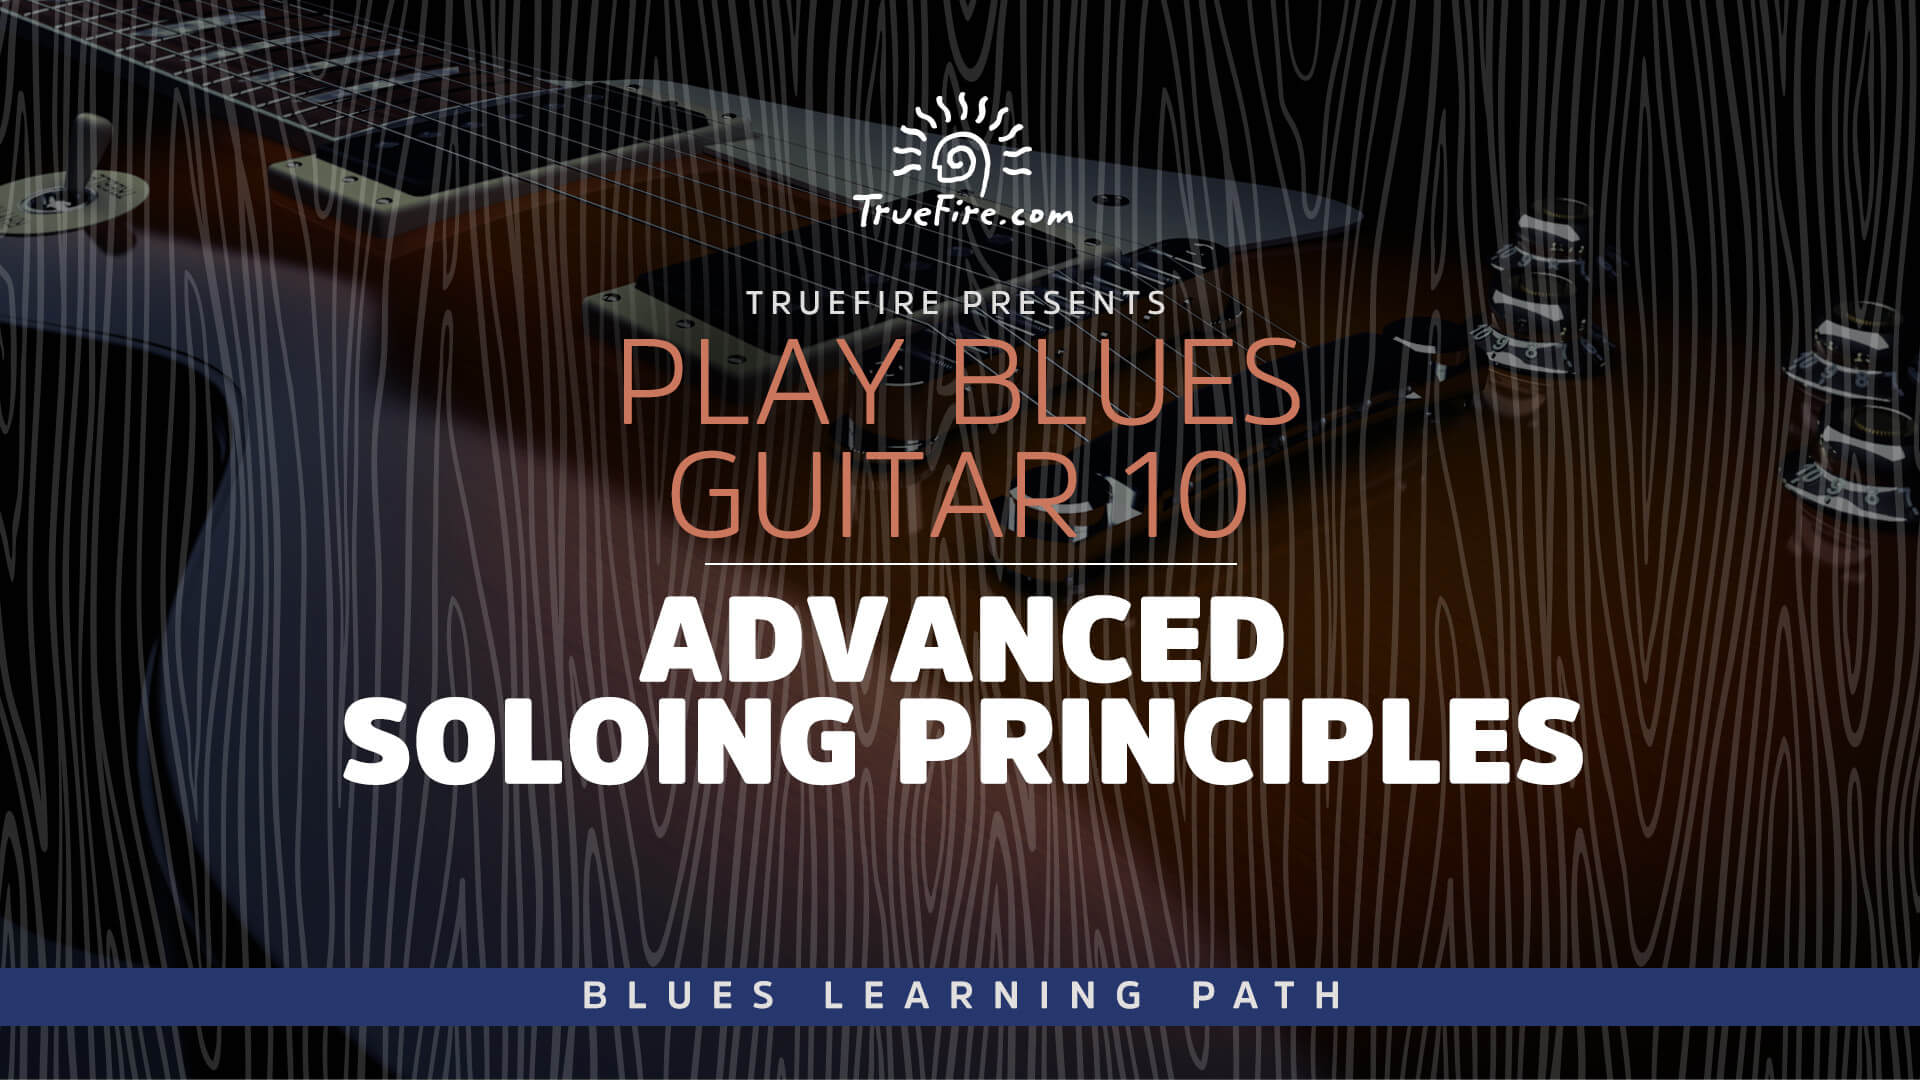 Play Blues Guitar 10: Advanced Soloing Principles - TrueFire